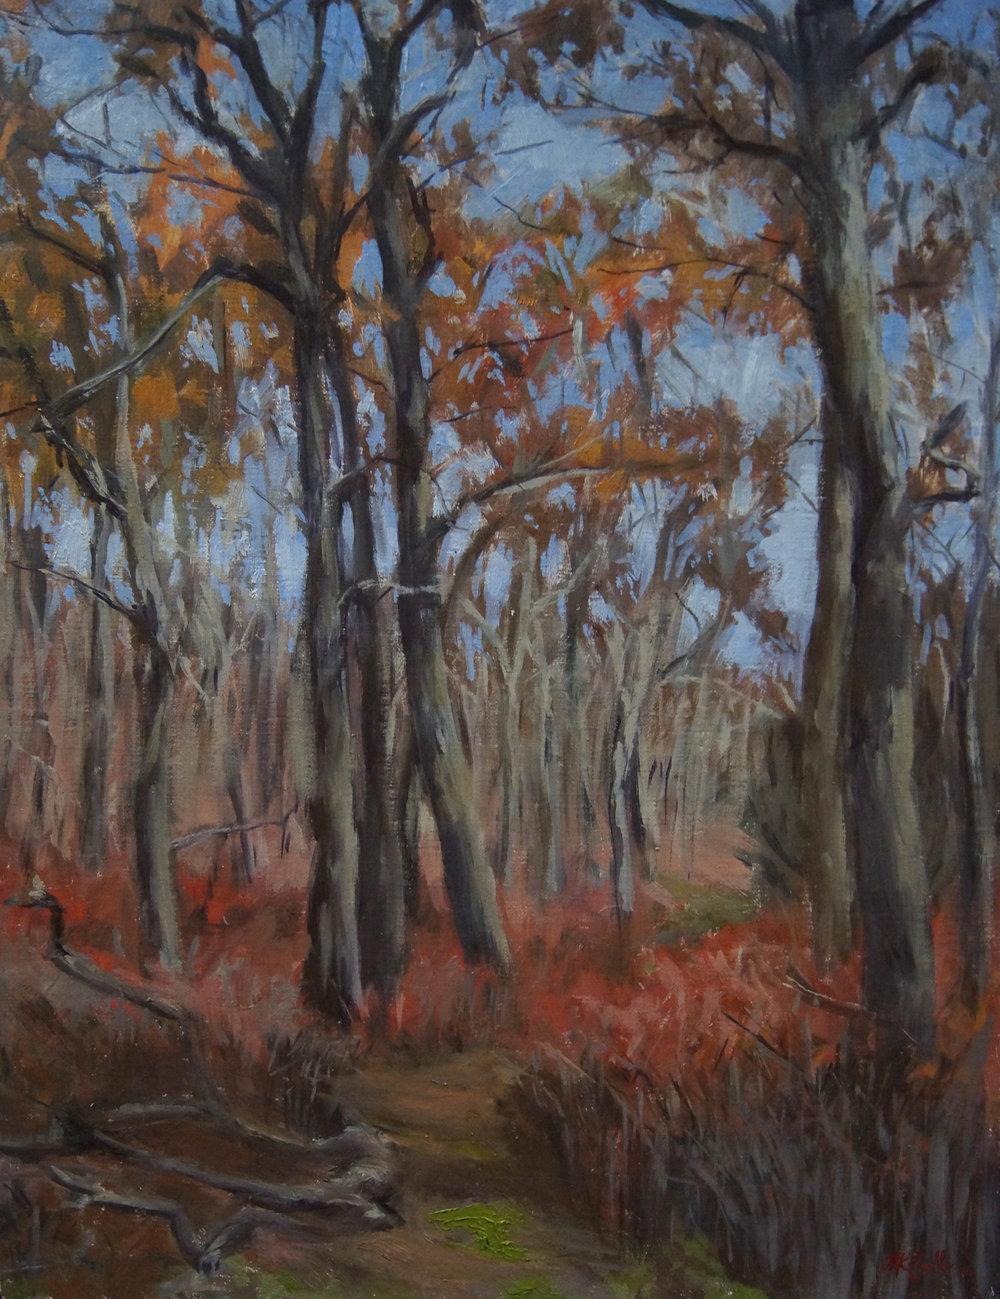 Forest Path, Sag Harbor Oil on panel, 18 x 14, 2016